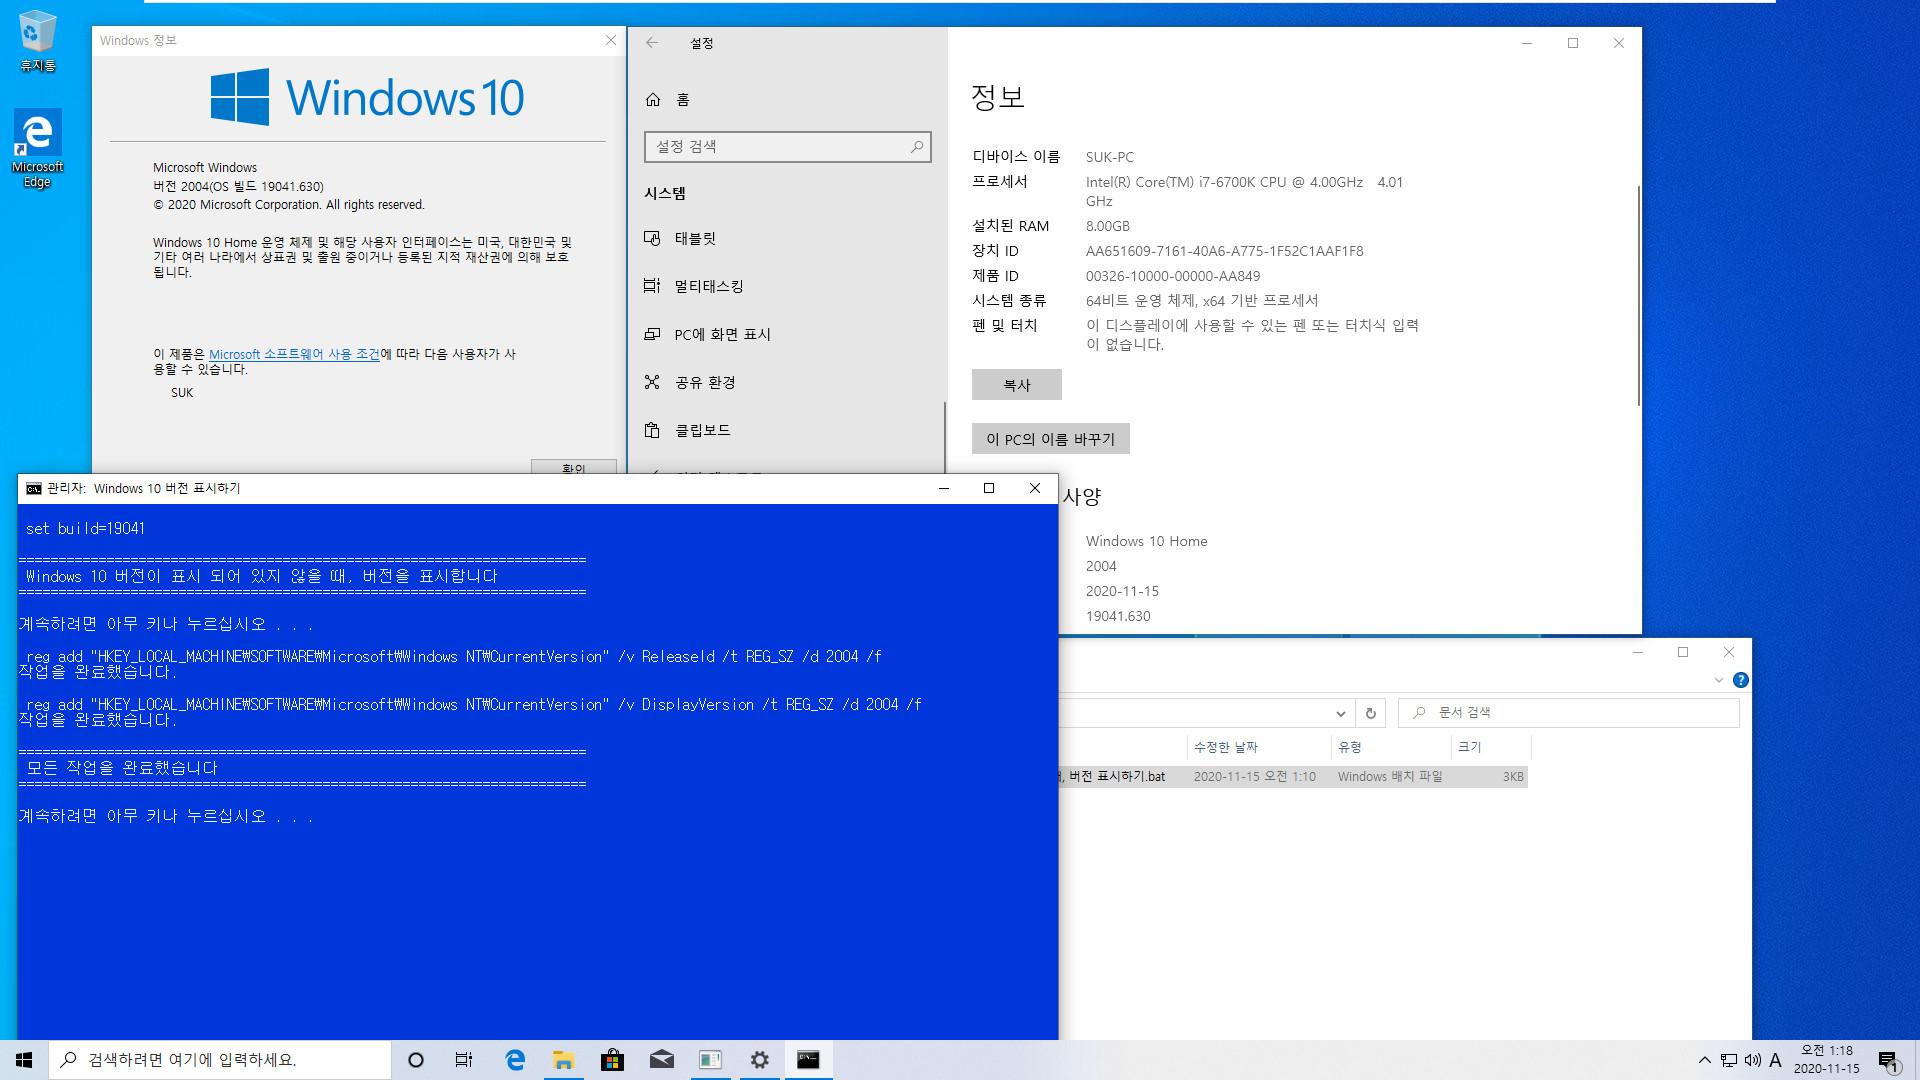 Windows 10 버전이 표시 되어 있지 않을 때, 버전 표시하기.bat 테스트 - Windows 10 버전 2004 윈도우 중에 버전이 표시되지 않는 윈도우가 있어서 만들게 됨 2020-11-15_011811.jpg